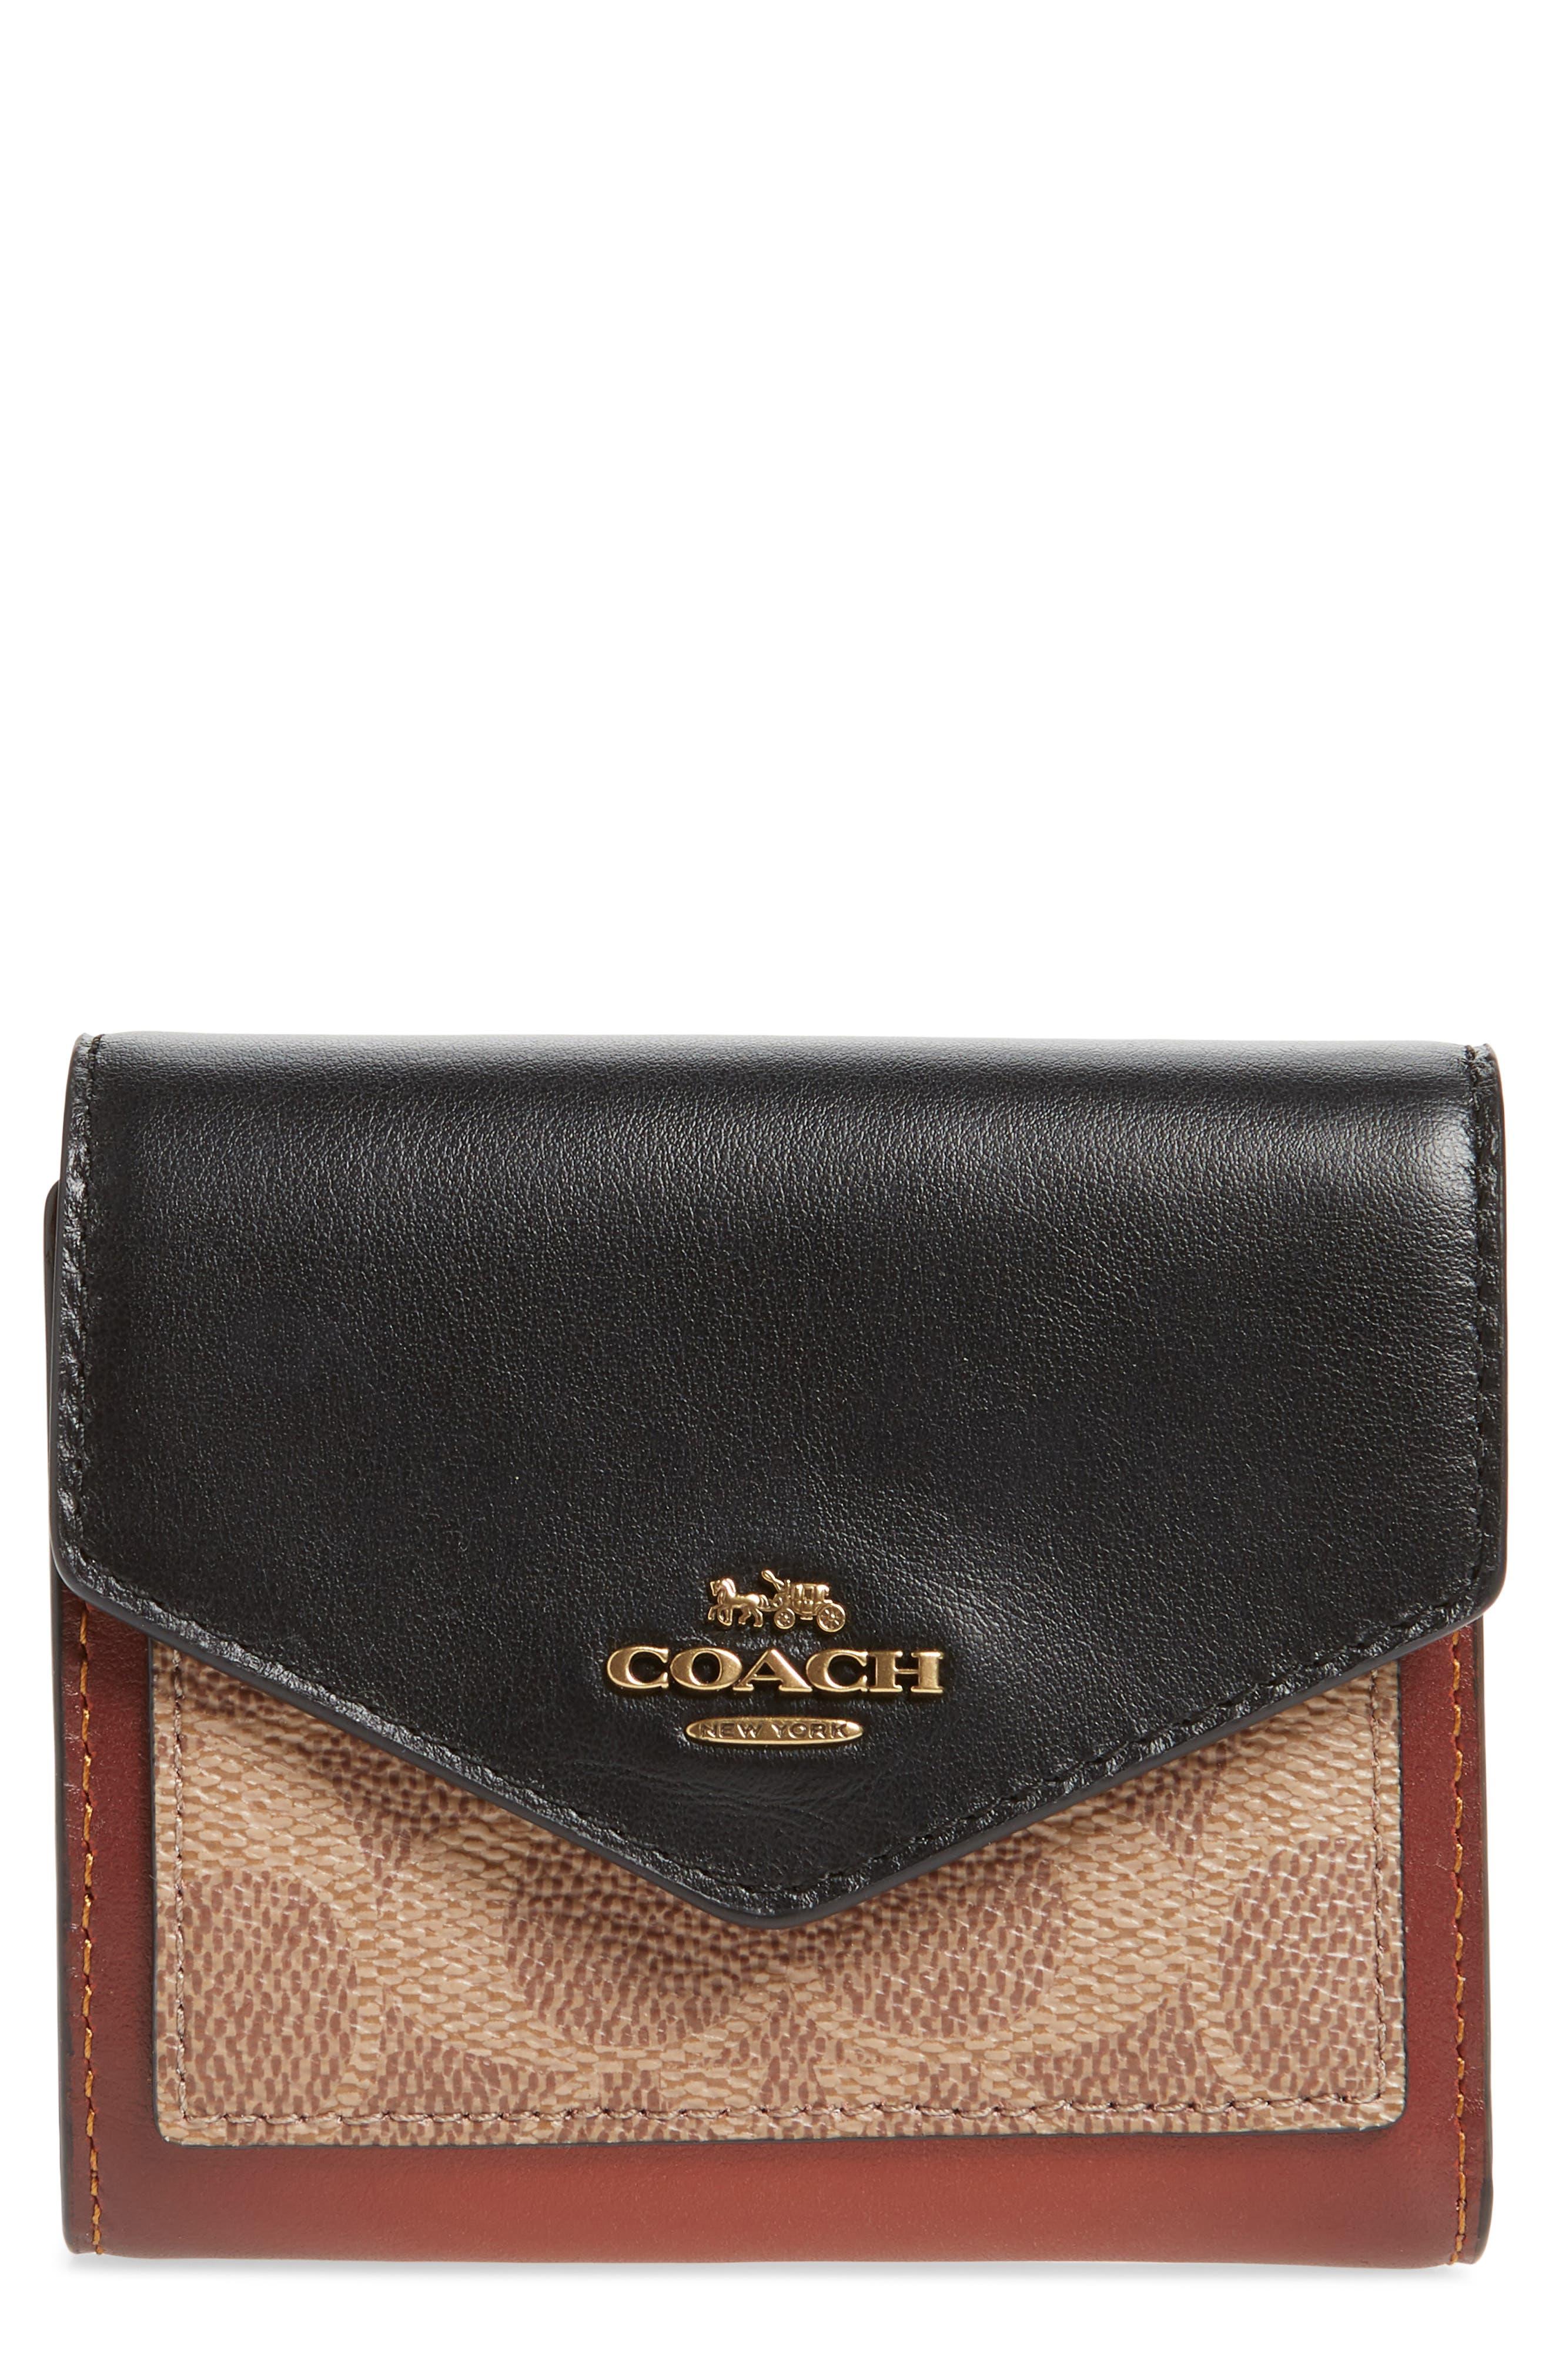 COACH Leather & Signature Canvas Trifold Wallet, Main, color, TAN BLACK